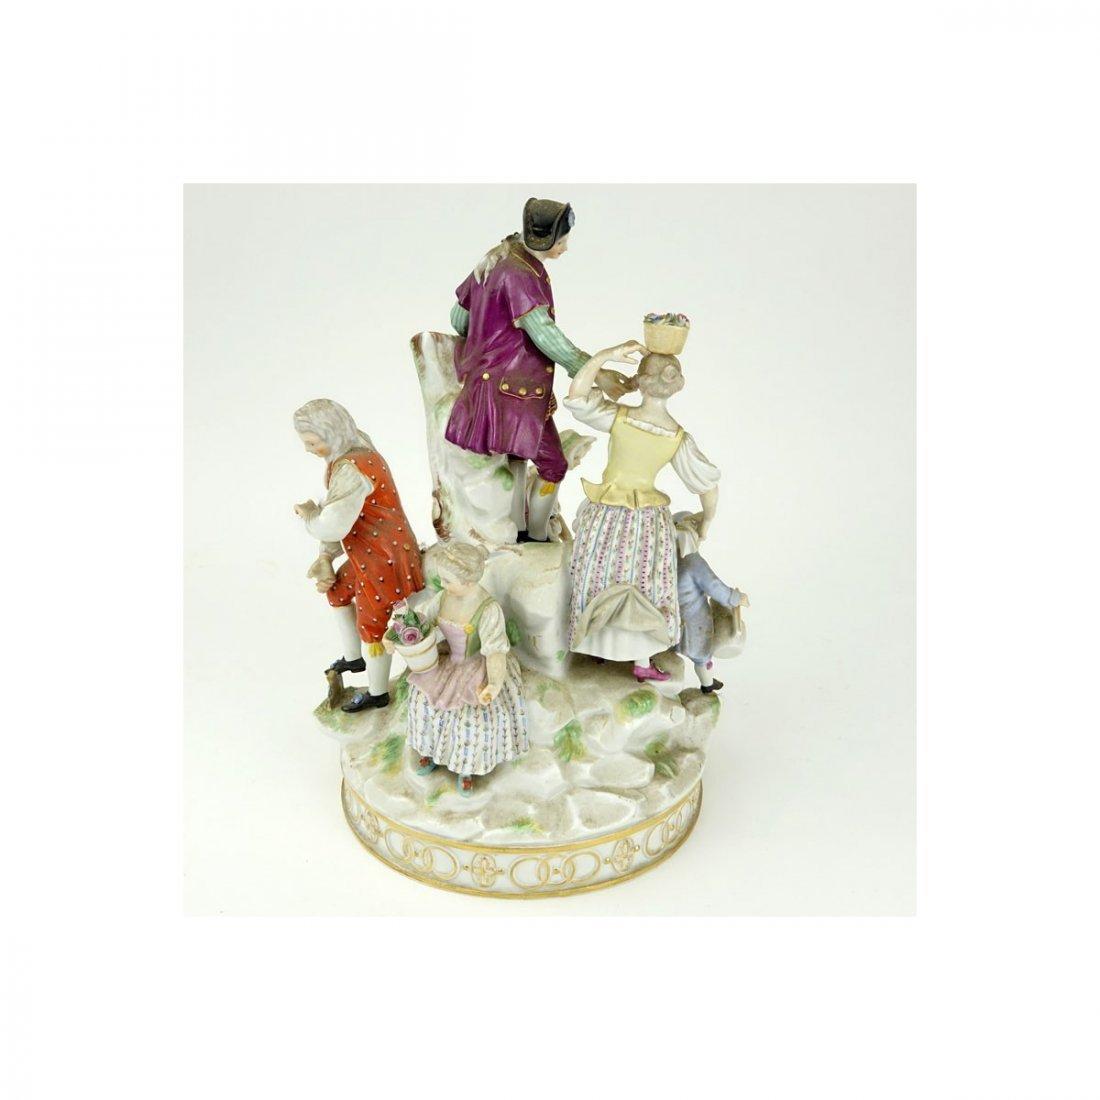 19th Century Meissen Hand Painted Porcelain Figural - 6